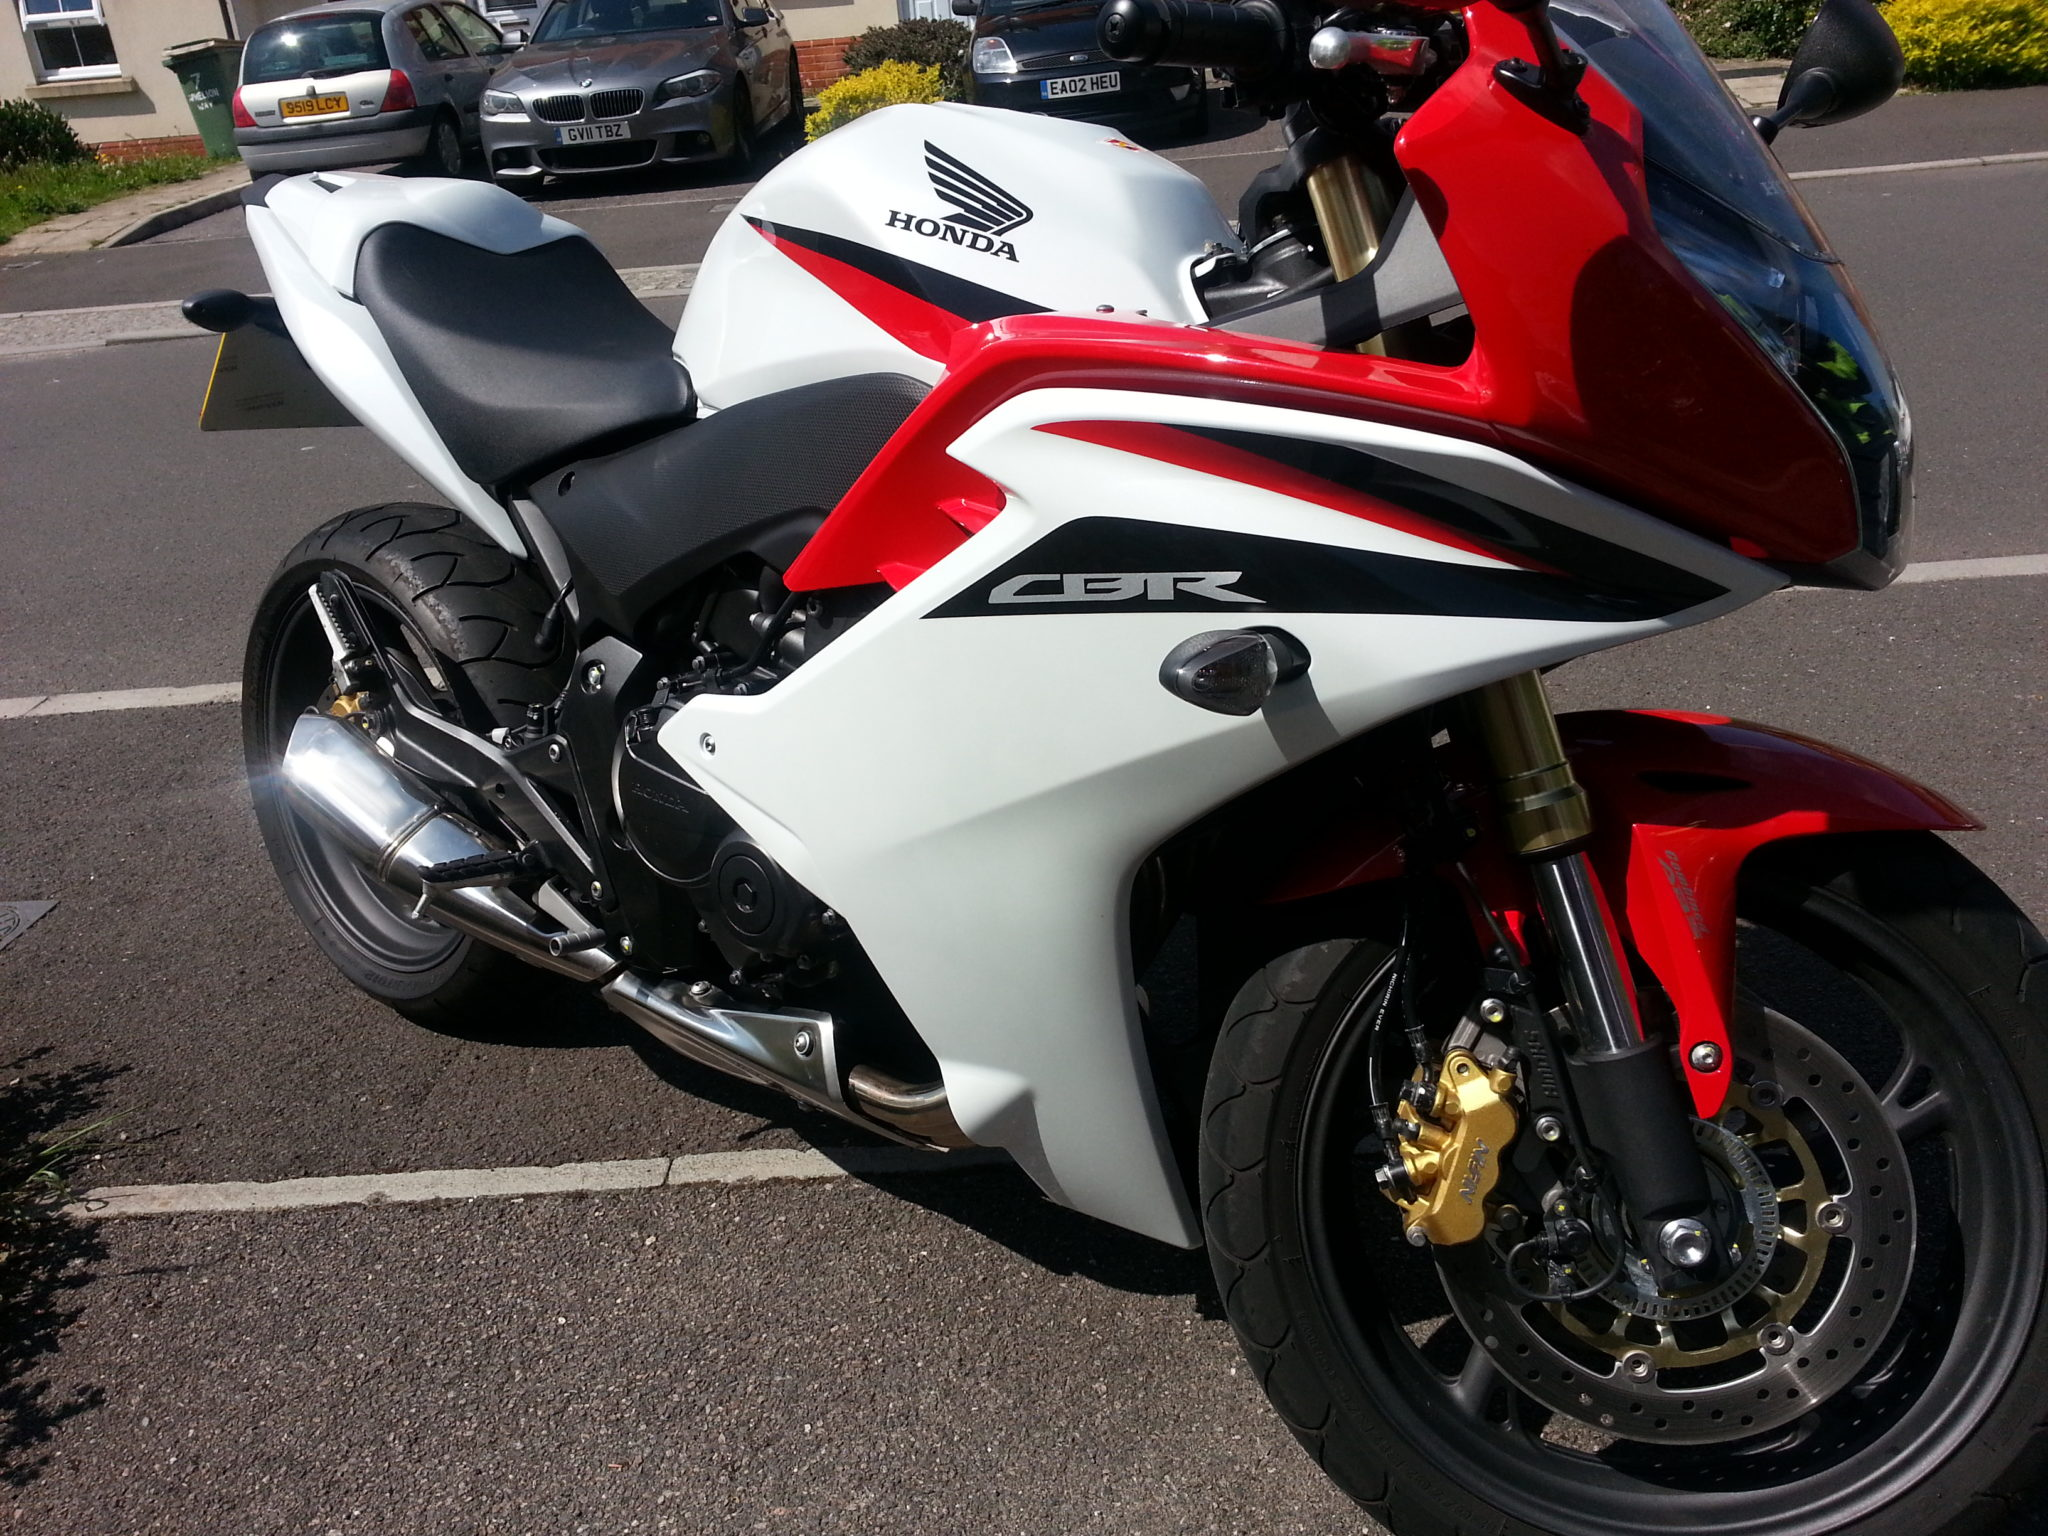 Sudhir – Honda CBR600F 2